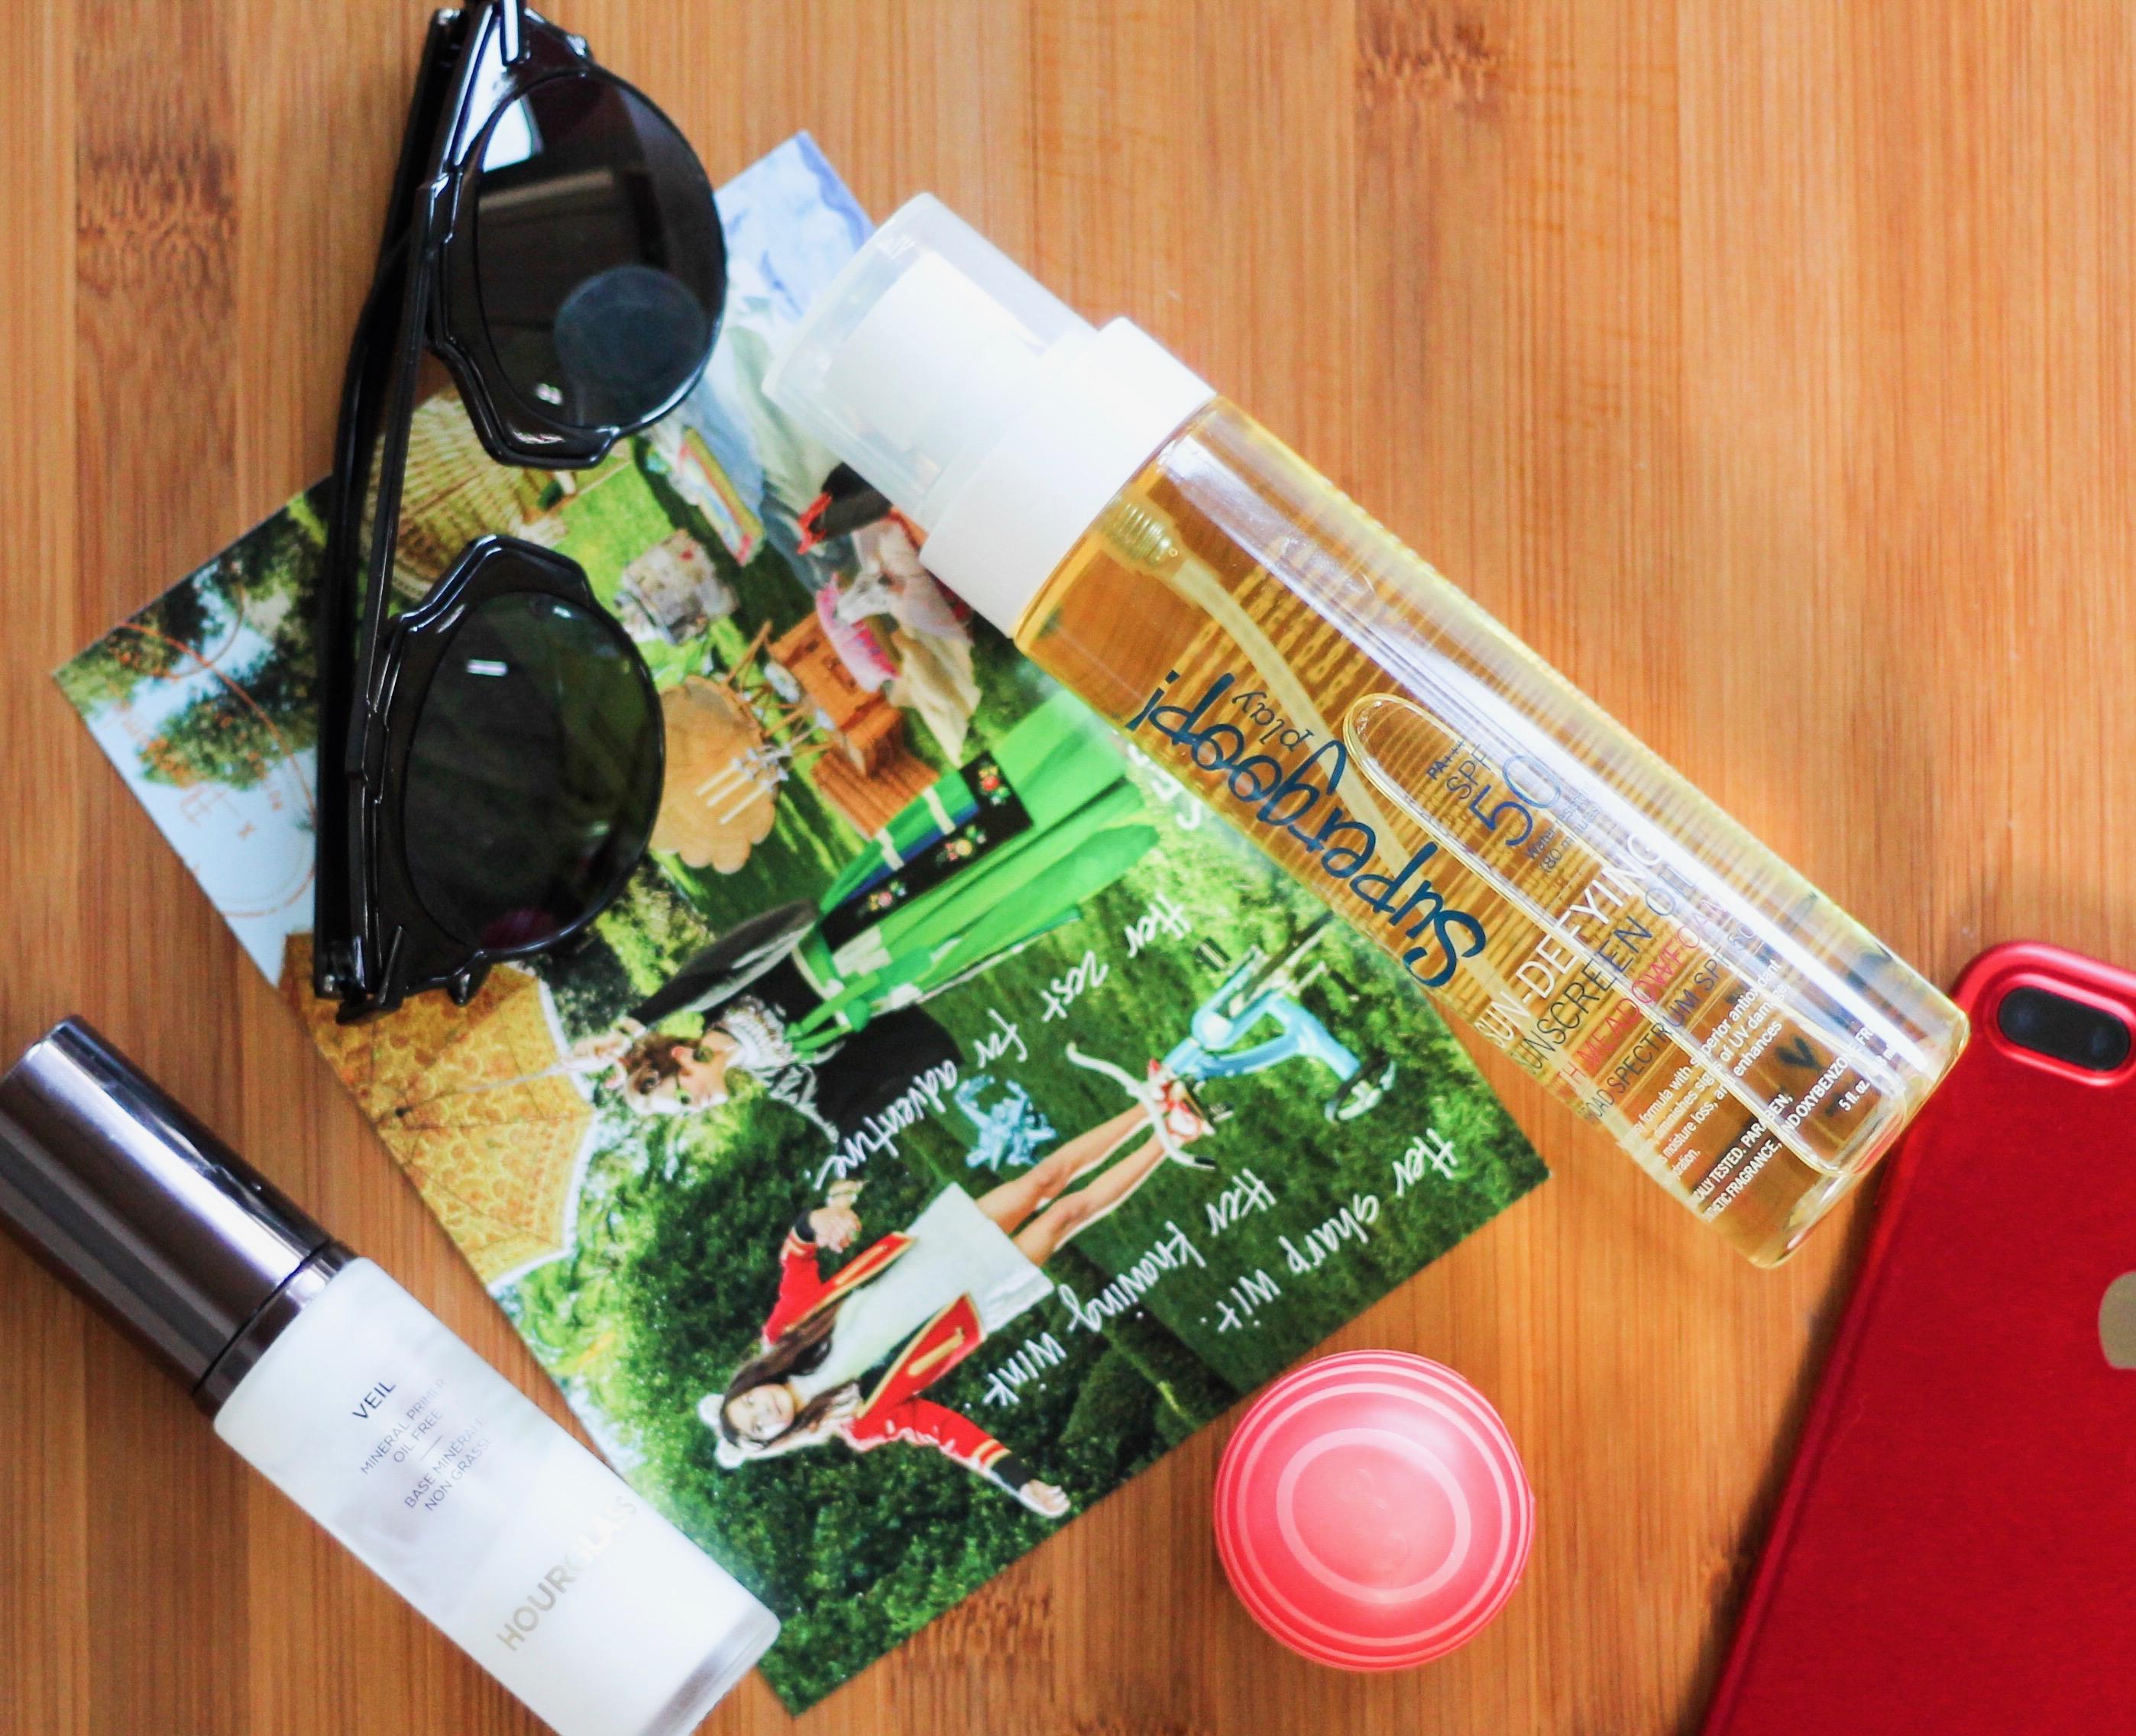 HOURGLASS Veil Mineral Primer, EOS Grapefruit Lip Balm SPF 30, SUPERGOOP! Sun-Defying Sunscreen Oil Broad Spectrum SPF 50